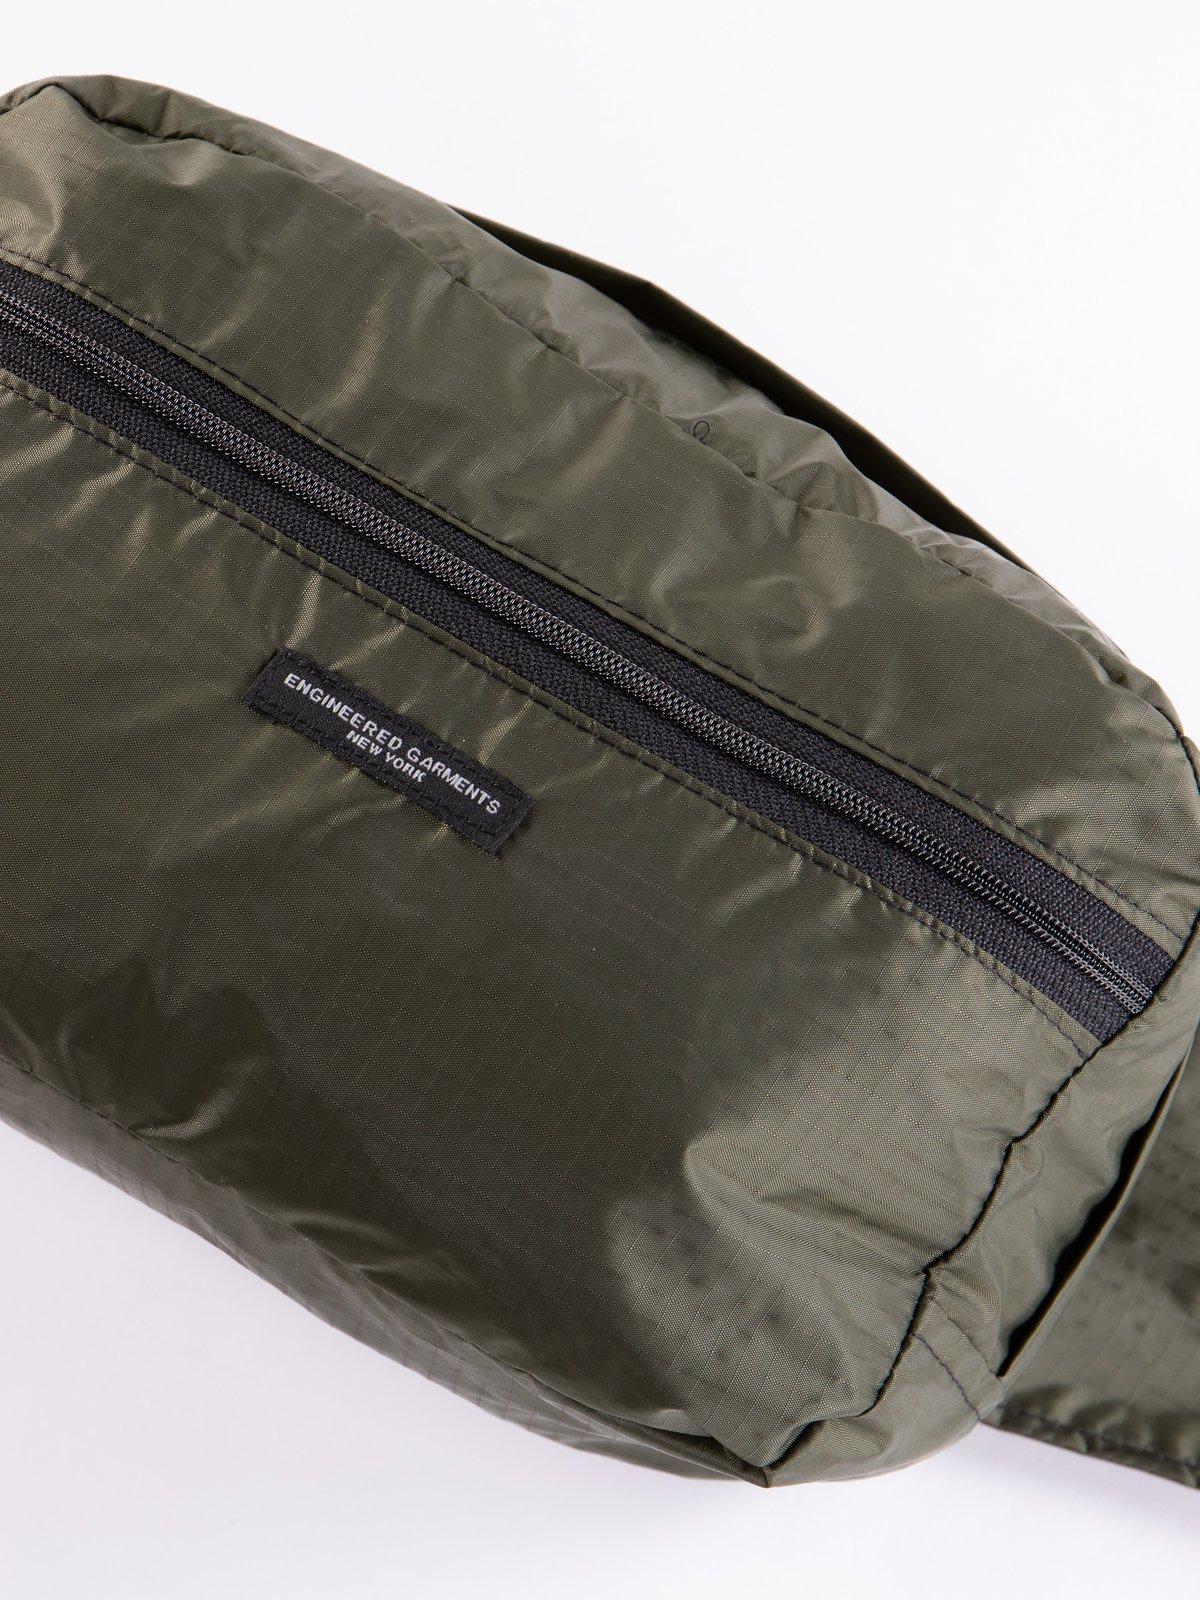 Olive Nylon Ripstop UL Waistpack - Image 2